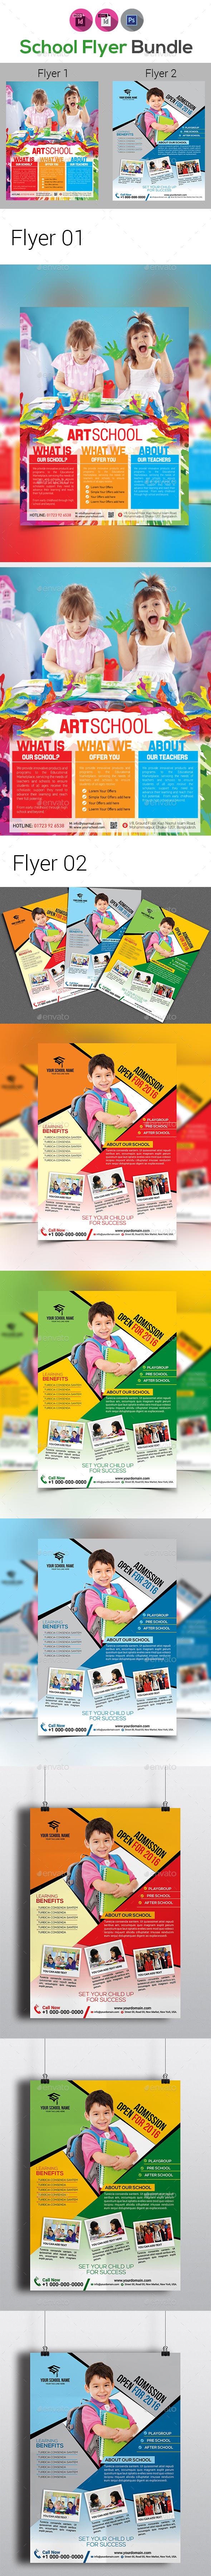 Kids Education Flyer Bundles - Corporate Flyers